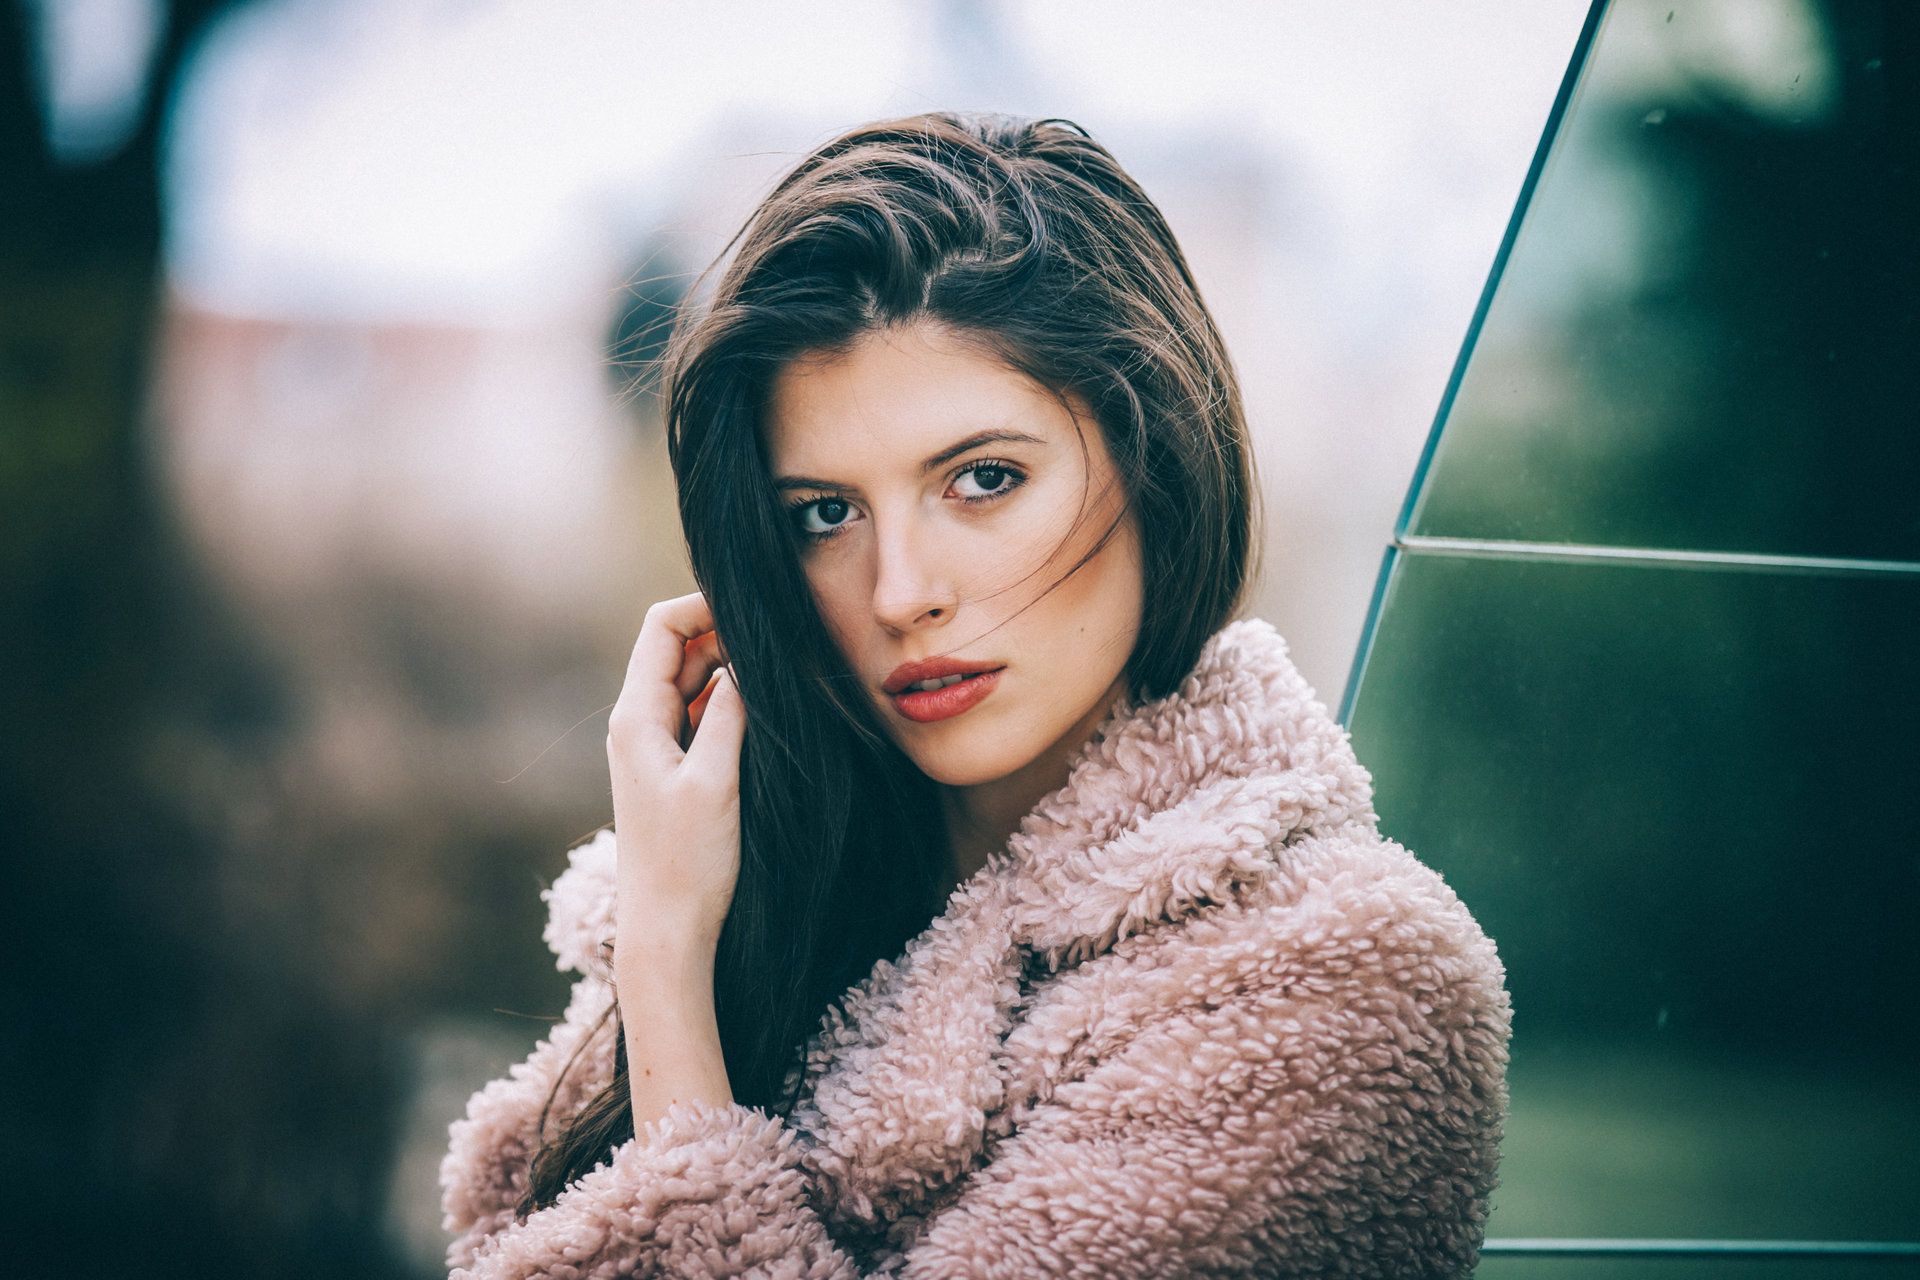 Photo in Portrait   Author aleksandar petrov - sandesko   PHOTO FORUM